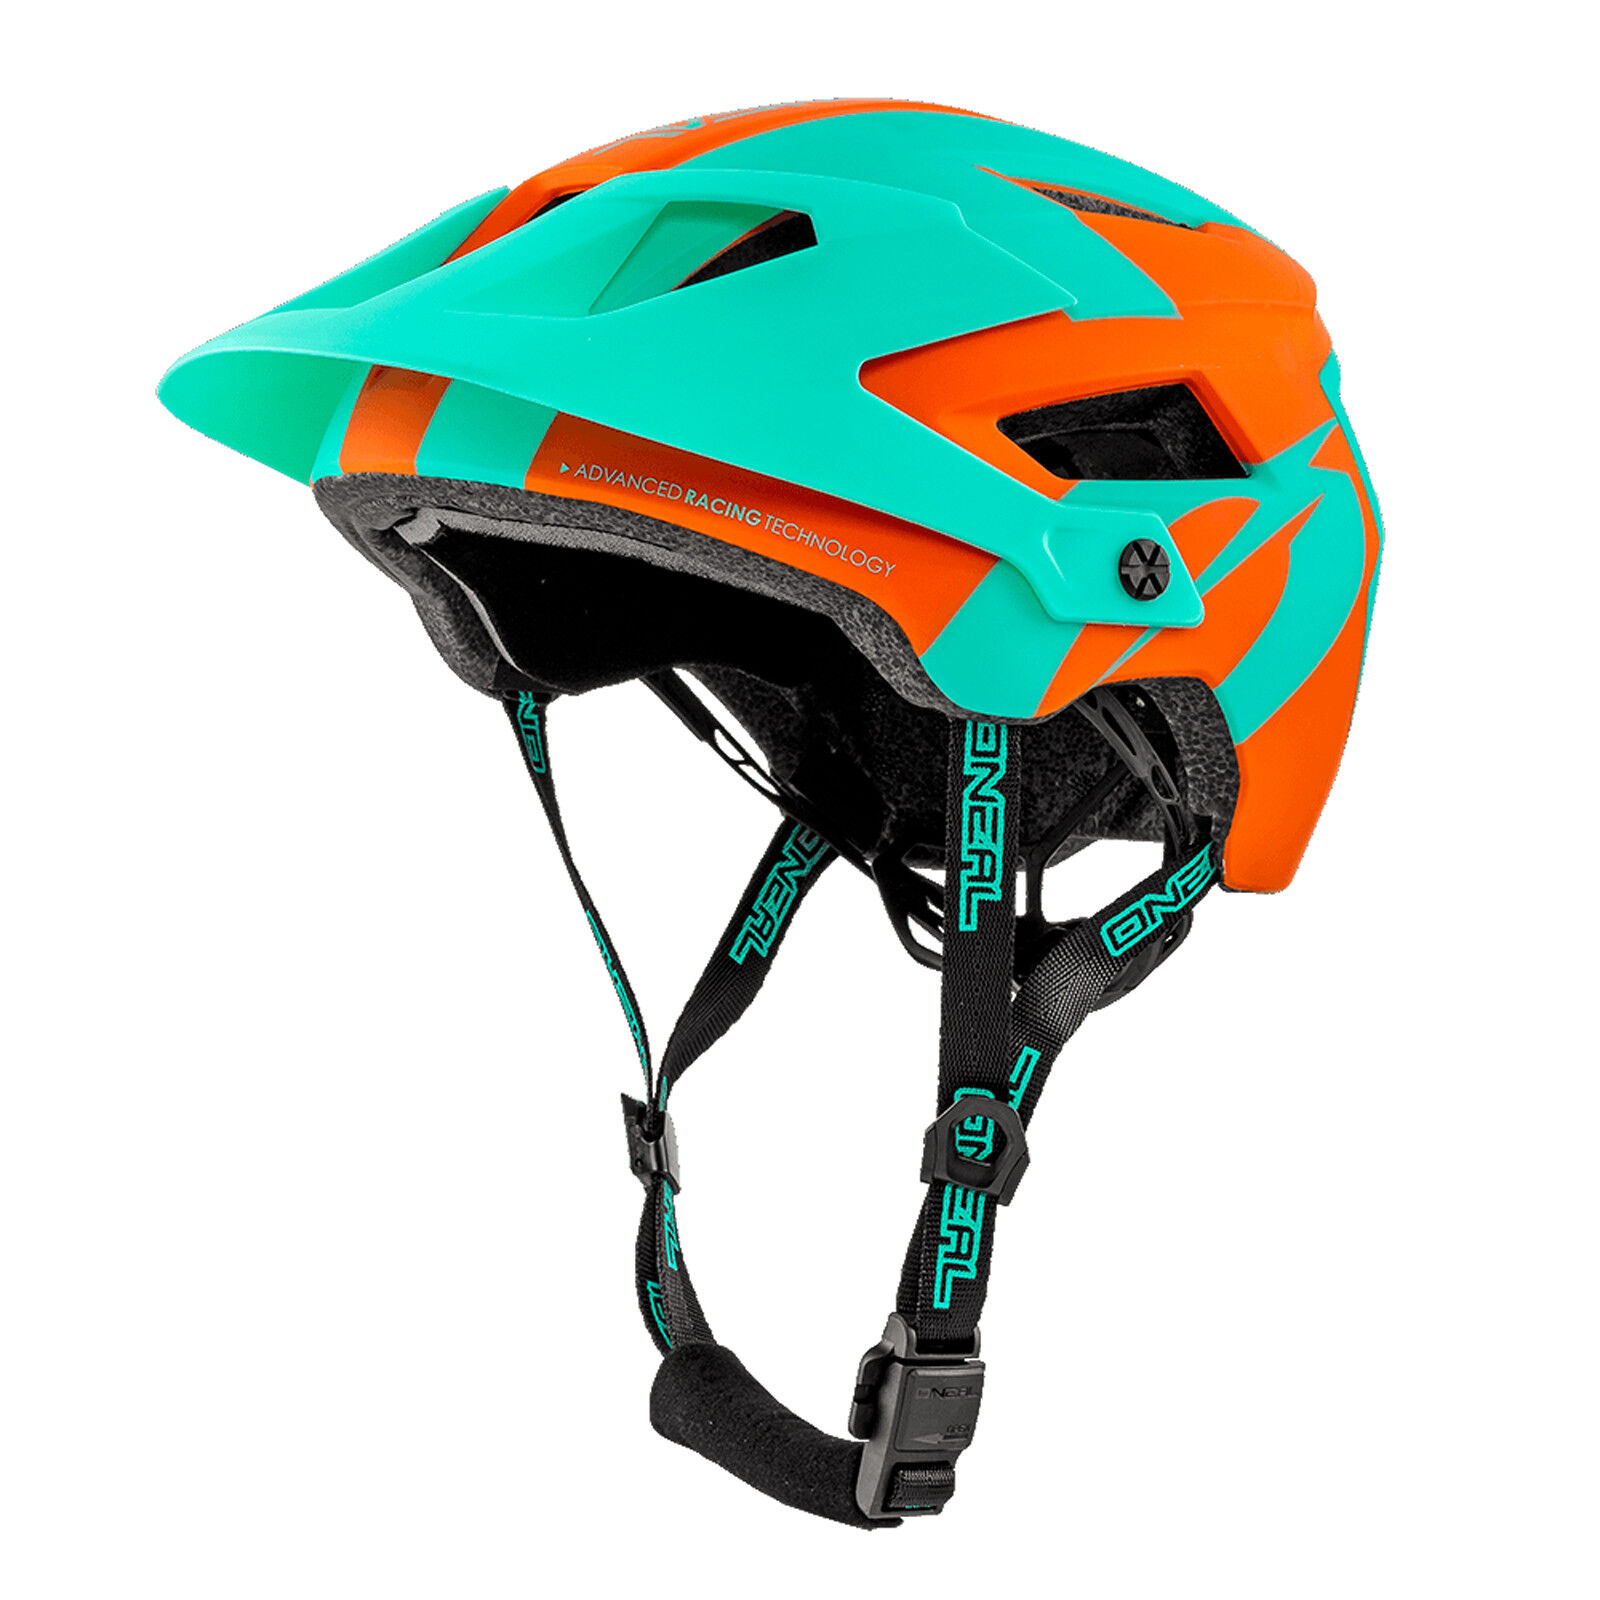 O 'neal defender 2.0 Sliver All mountain MTB casco de bicicleta naranja turquesa 2019 Onea